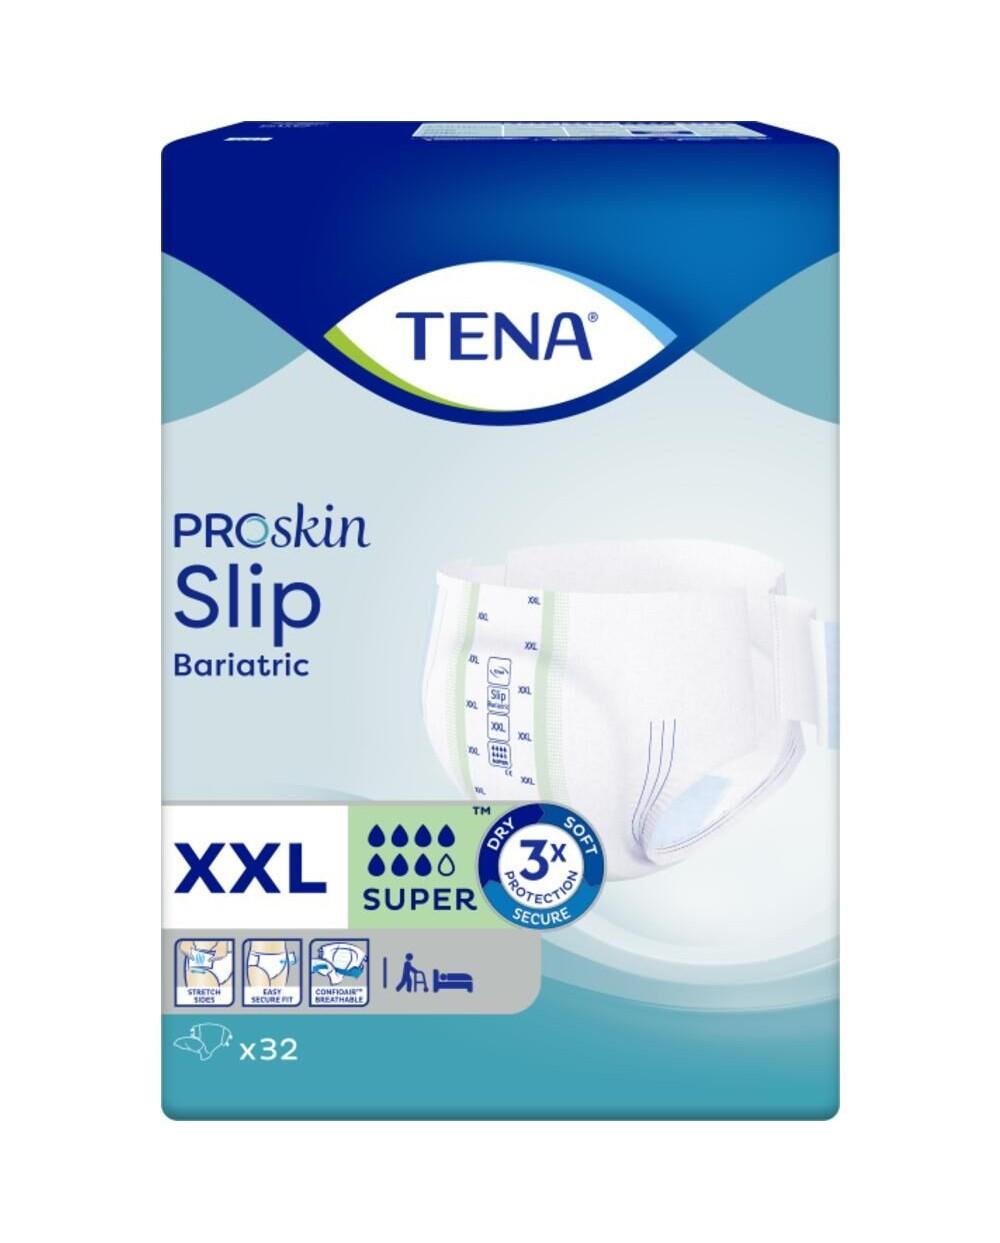 Tena Slip Bariatric Super XXL - 32 protections